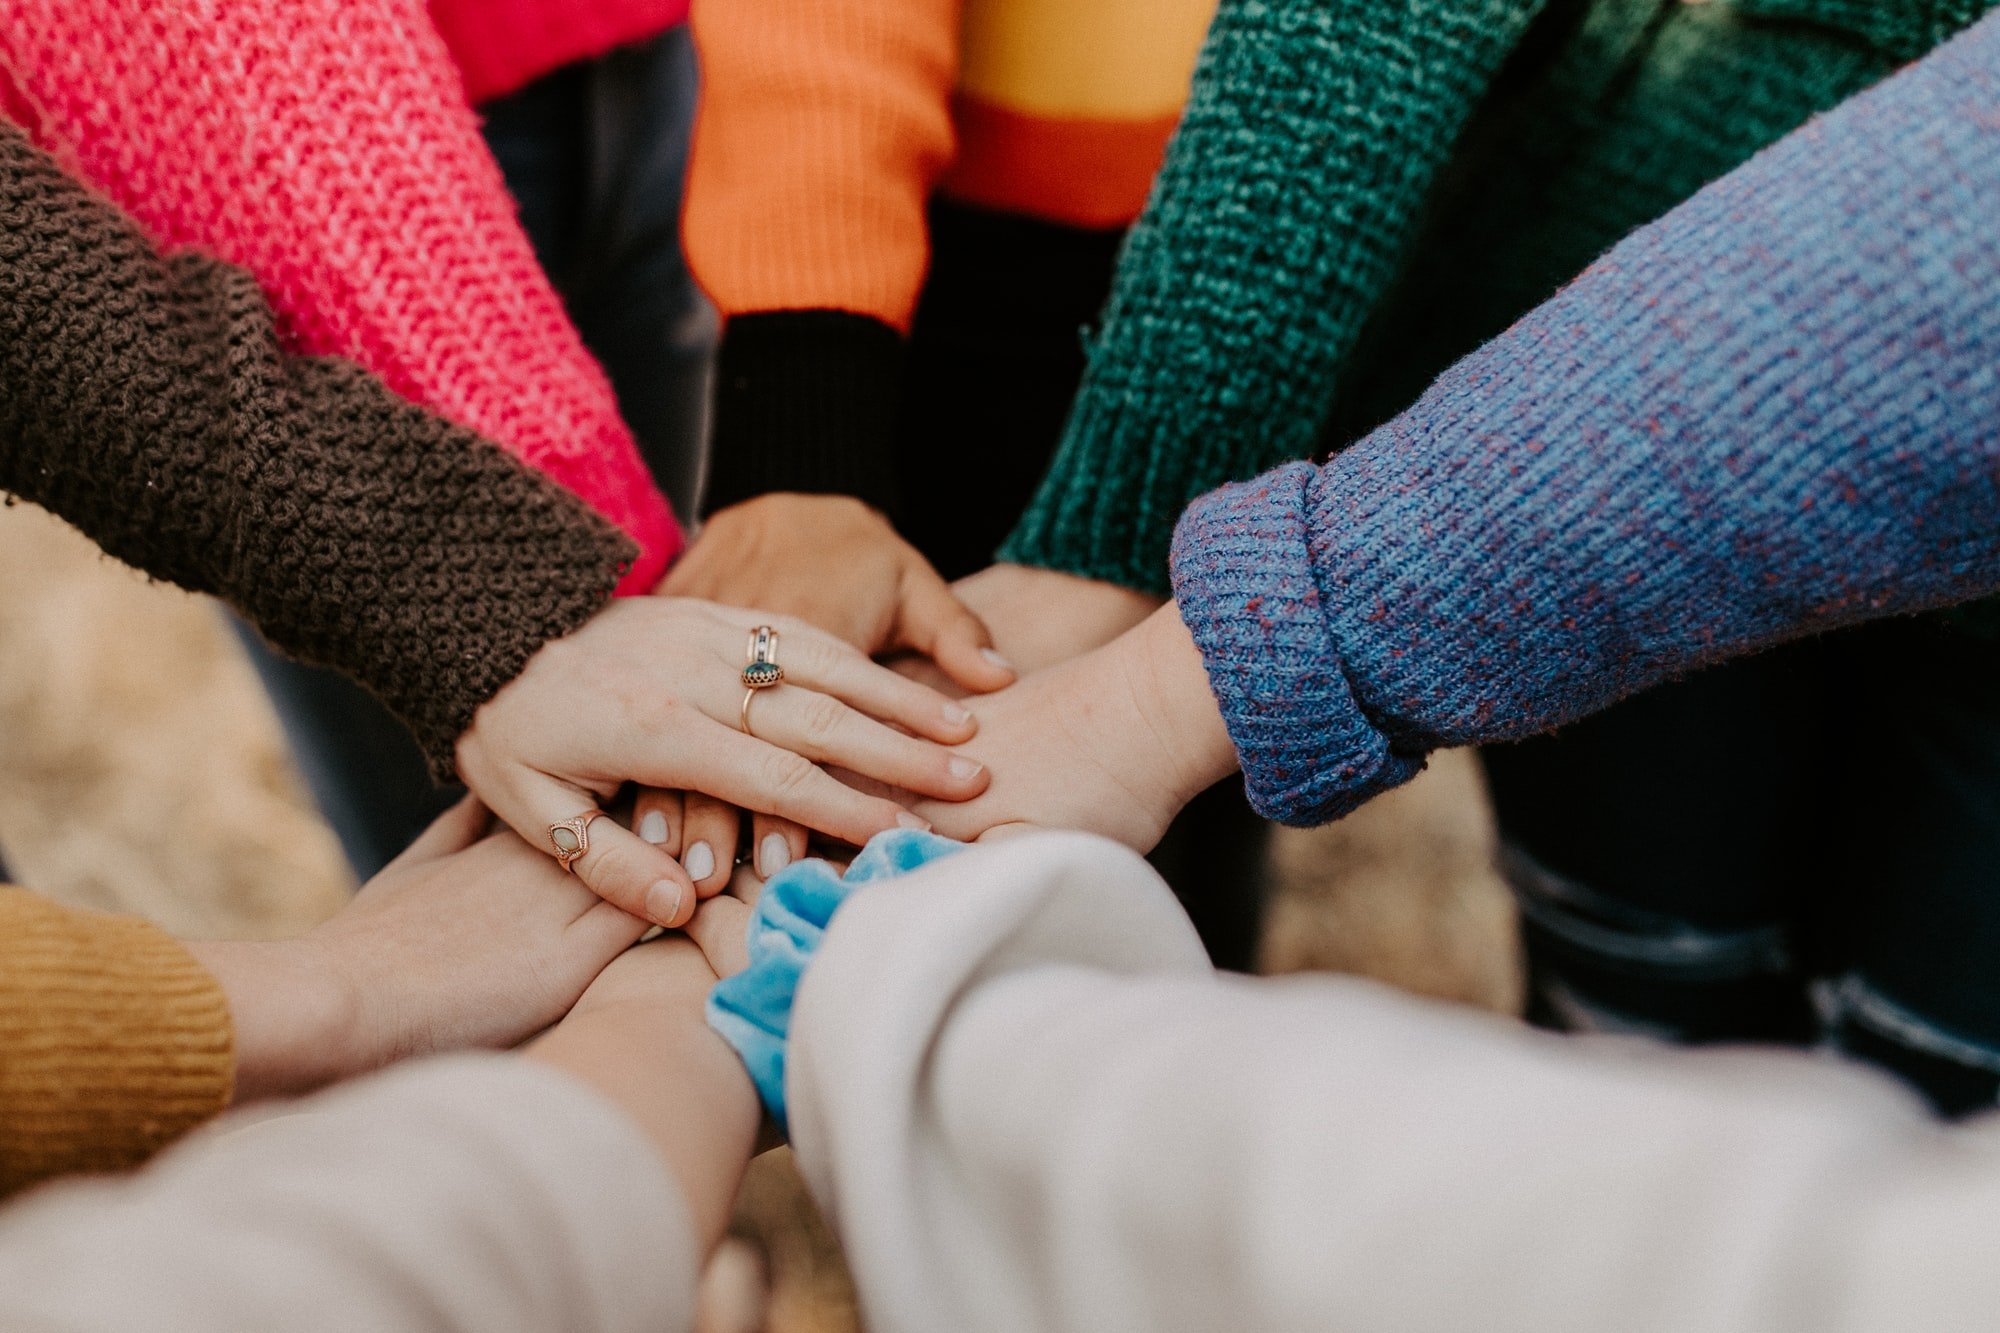 community hands together